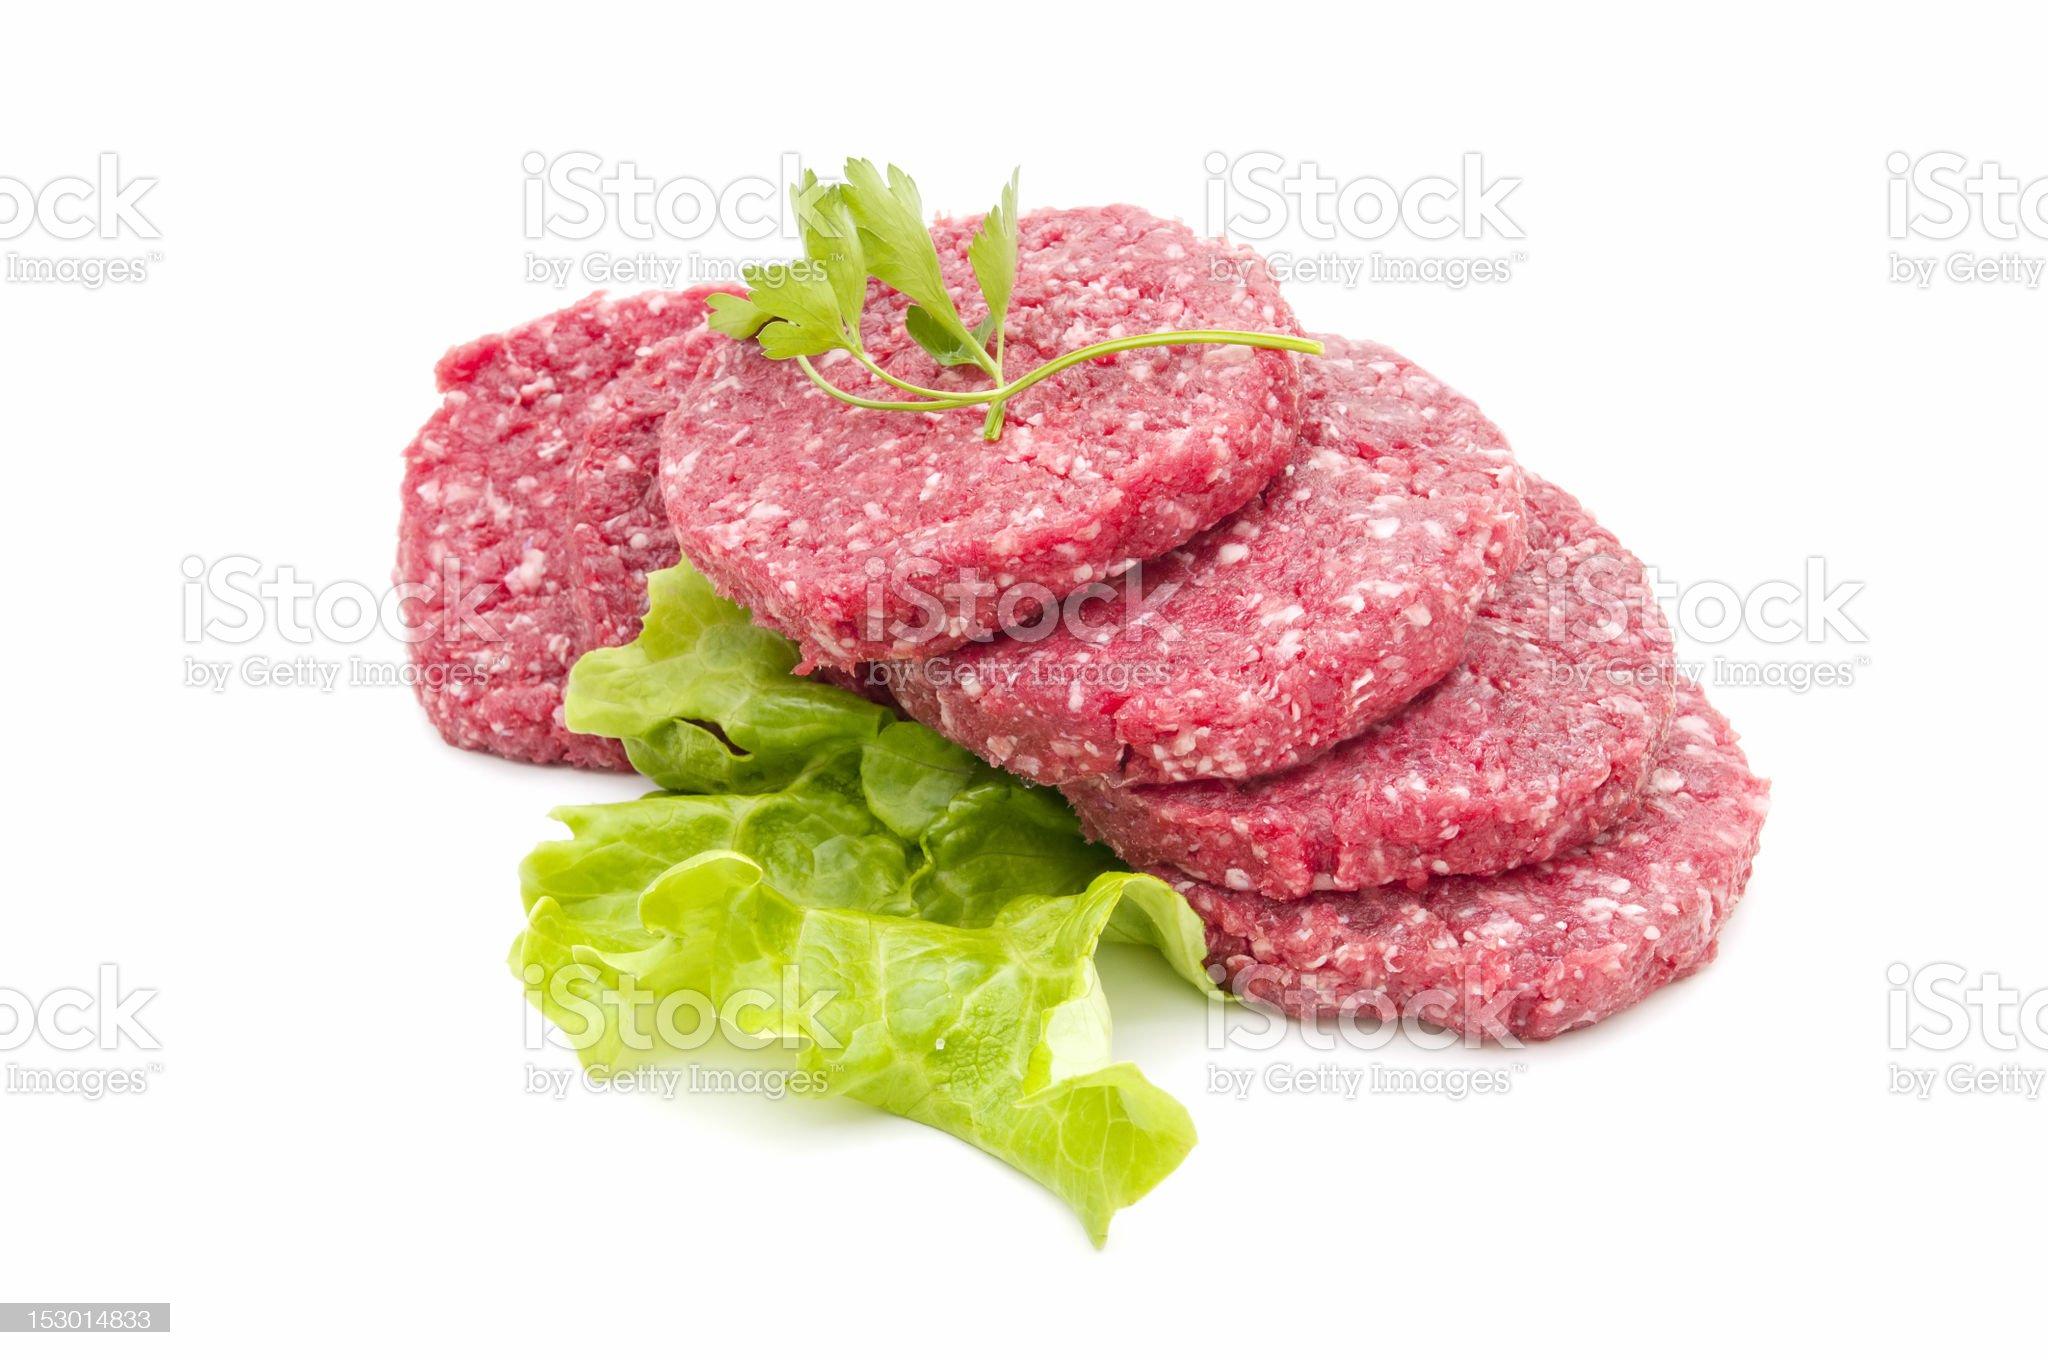 raw hamburger royalty-free stock photo